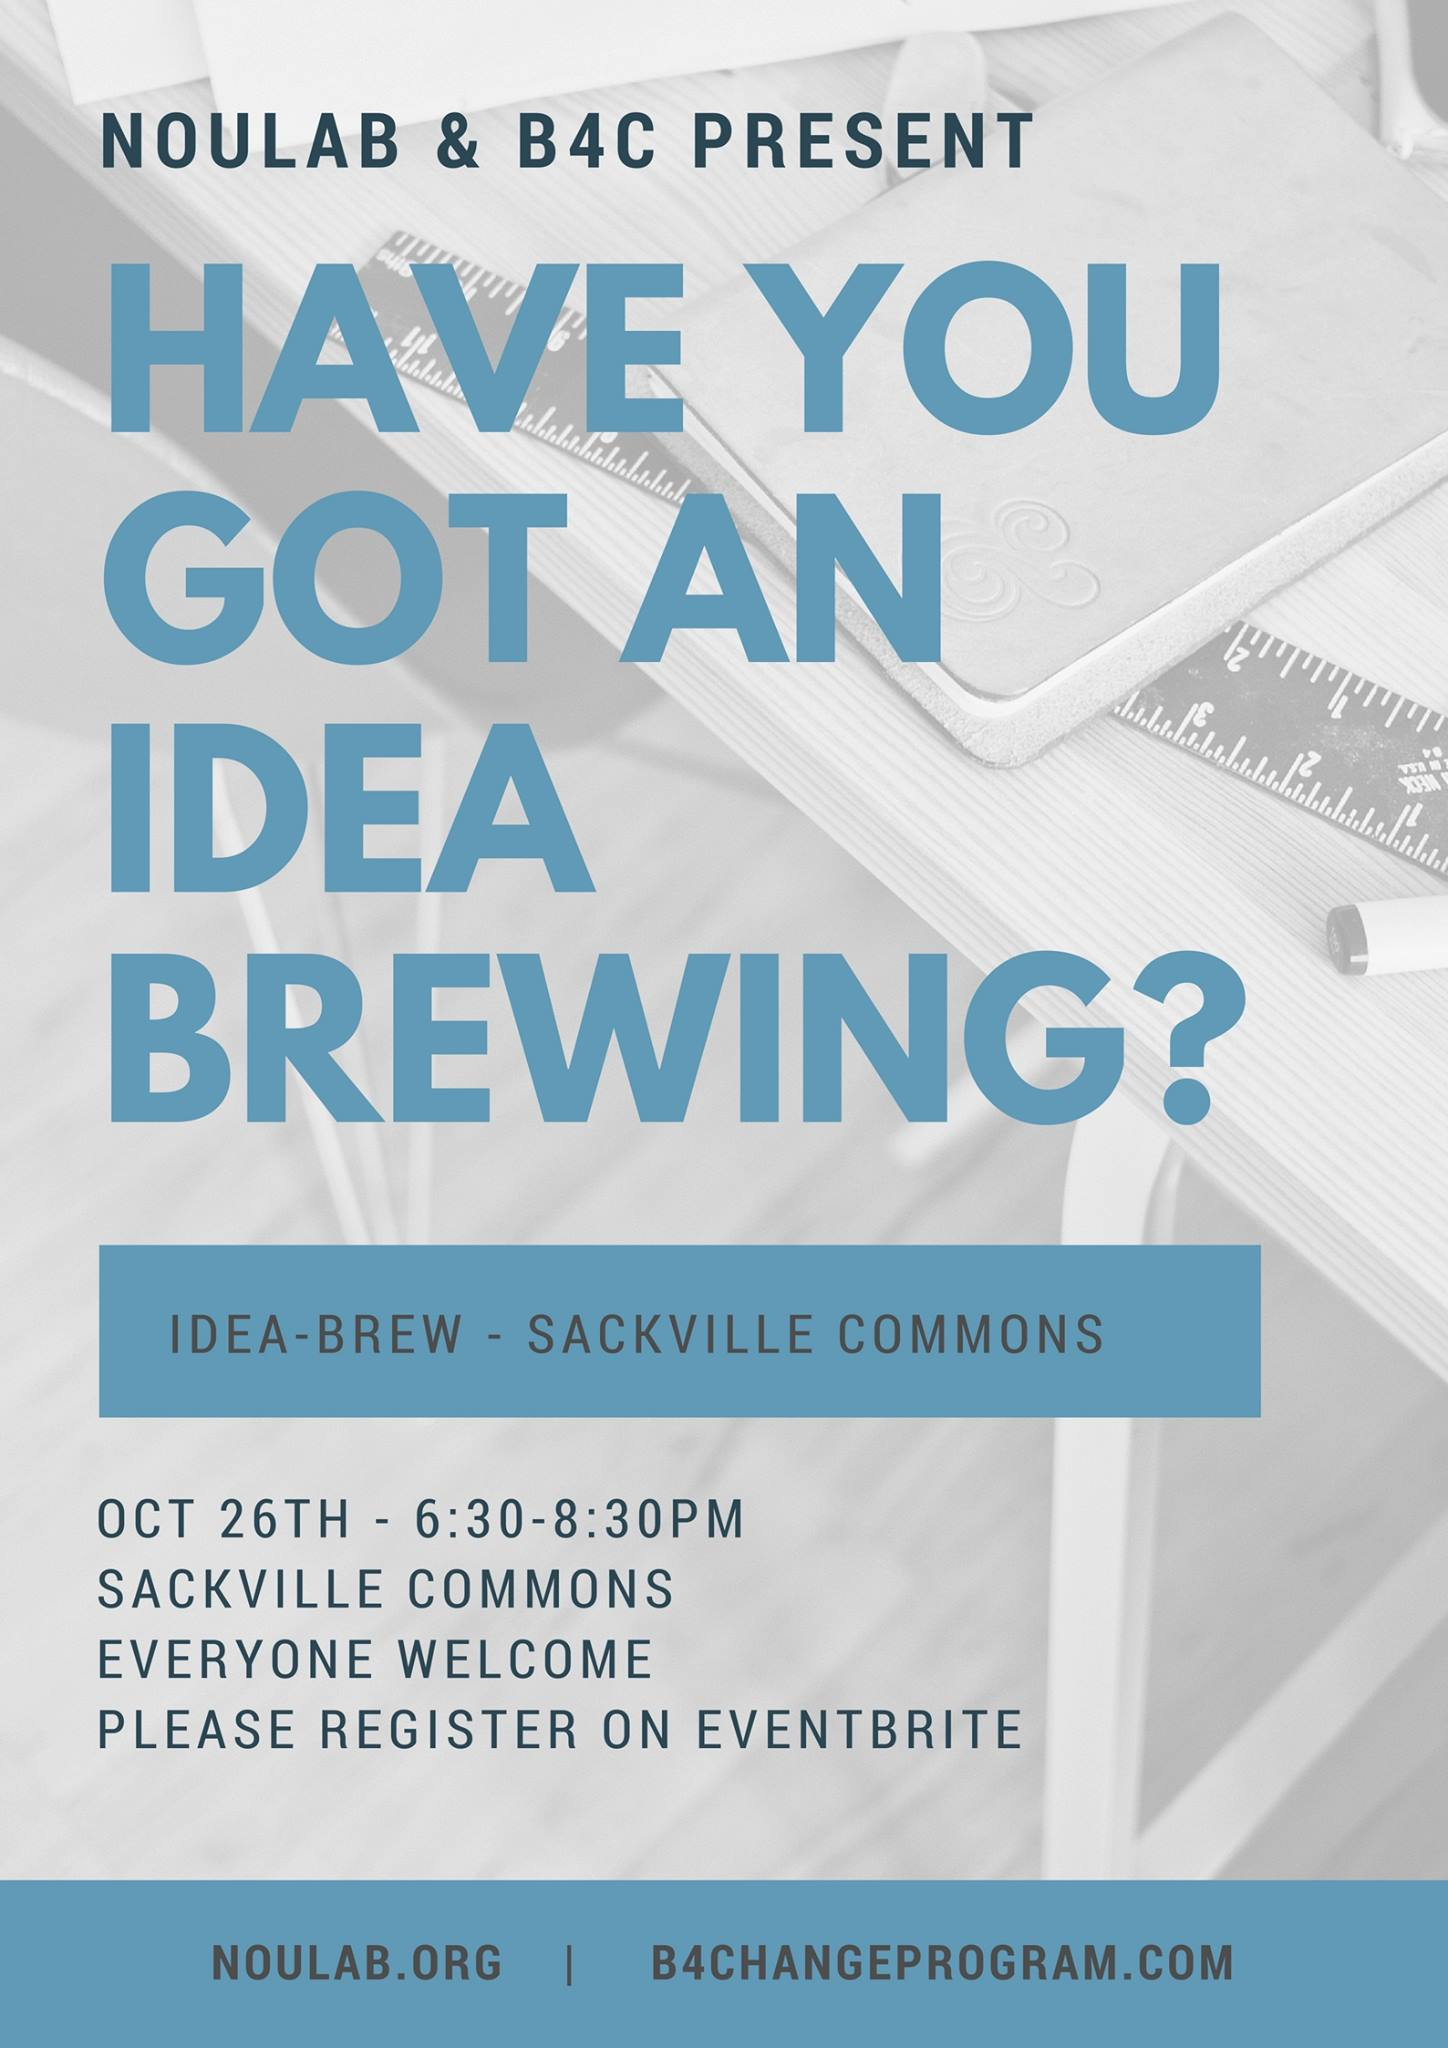 Come Brew your ideas!